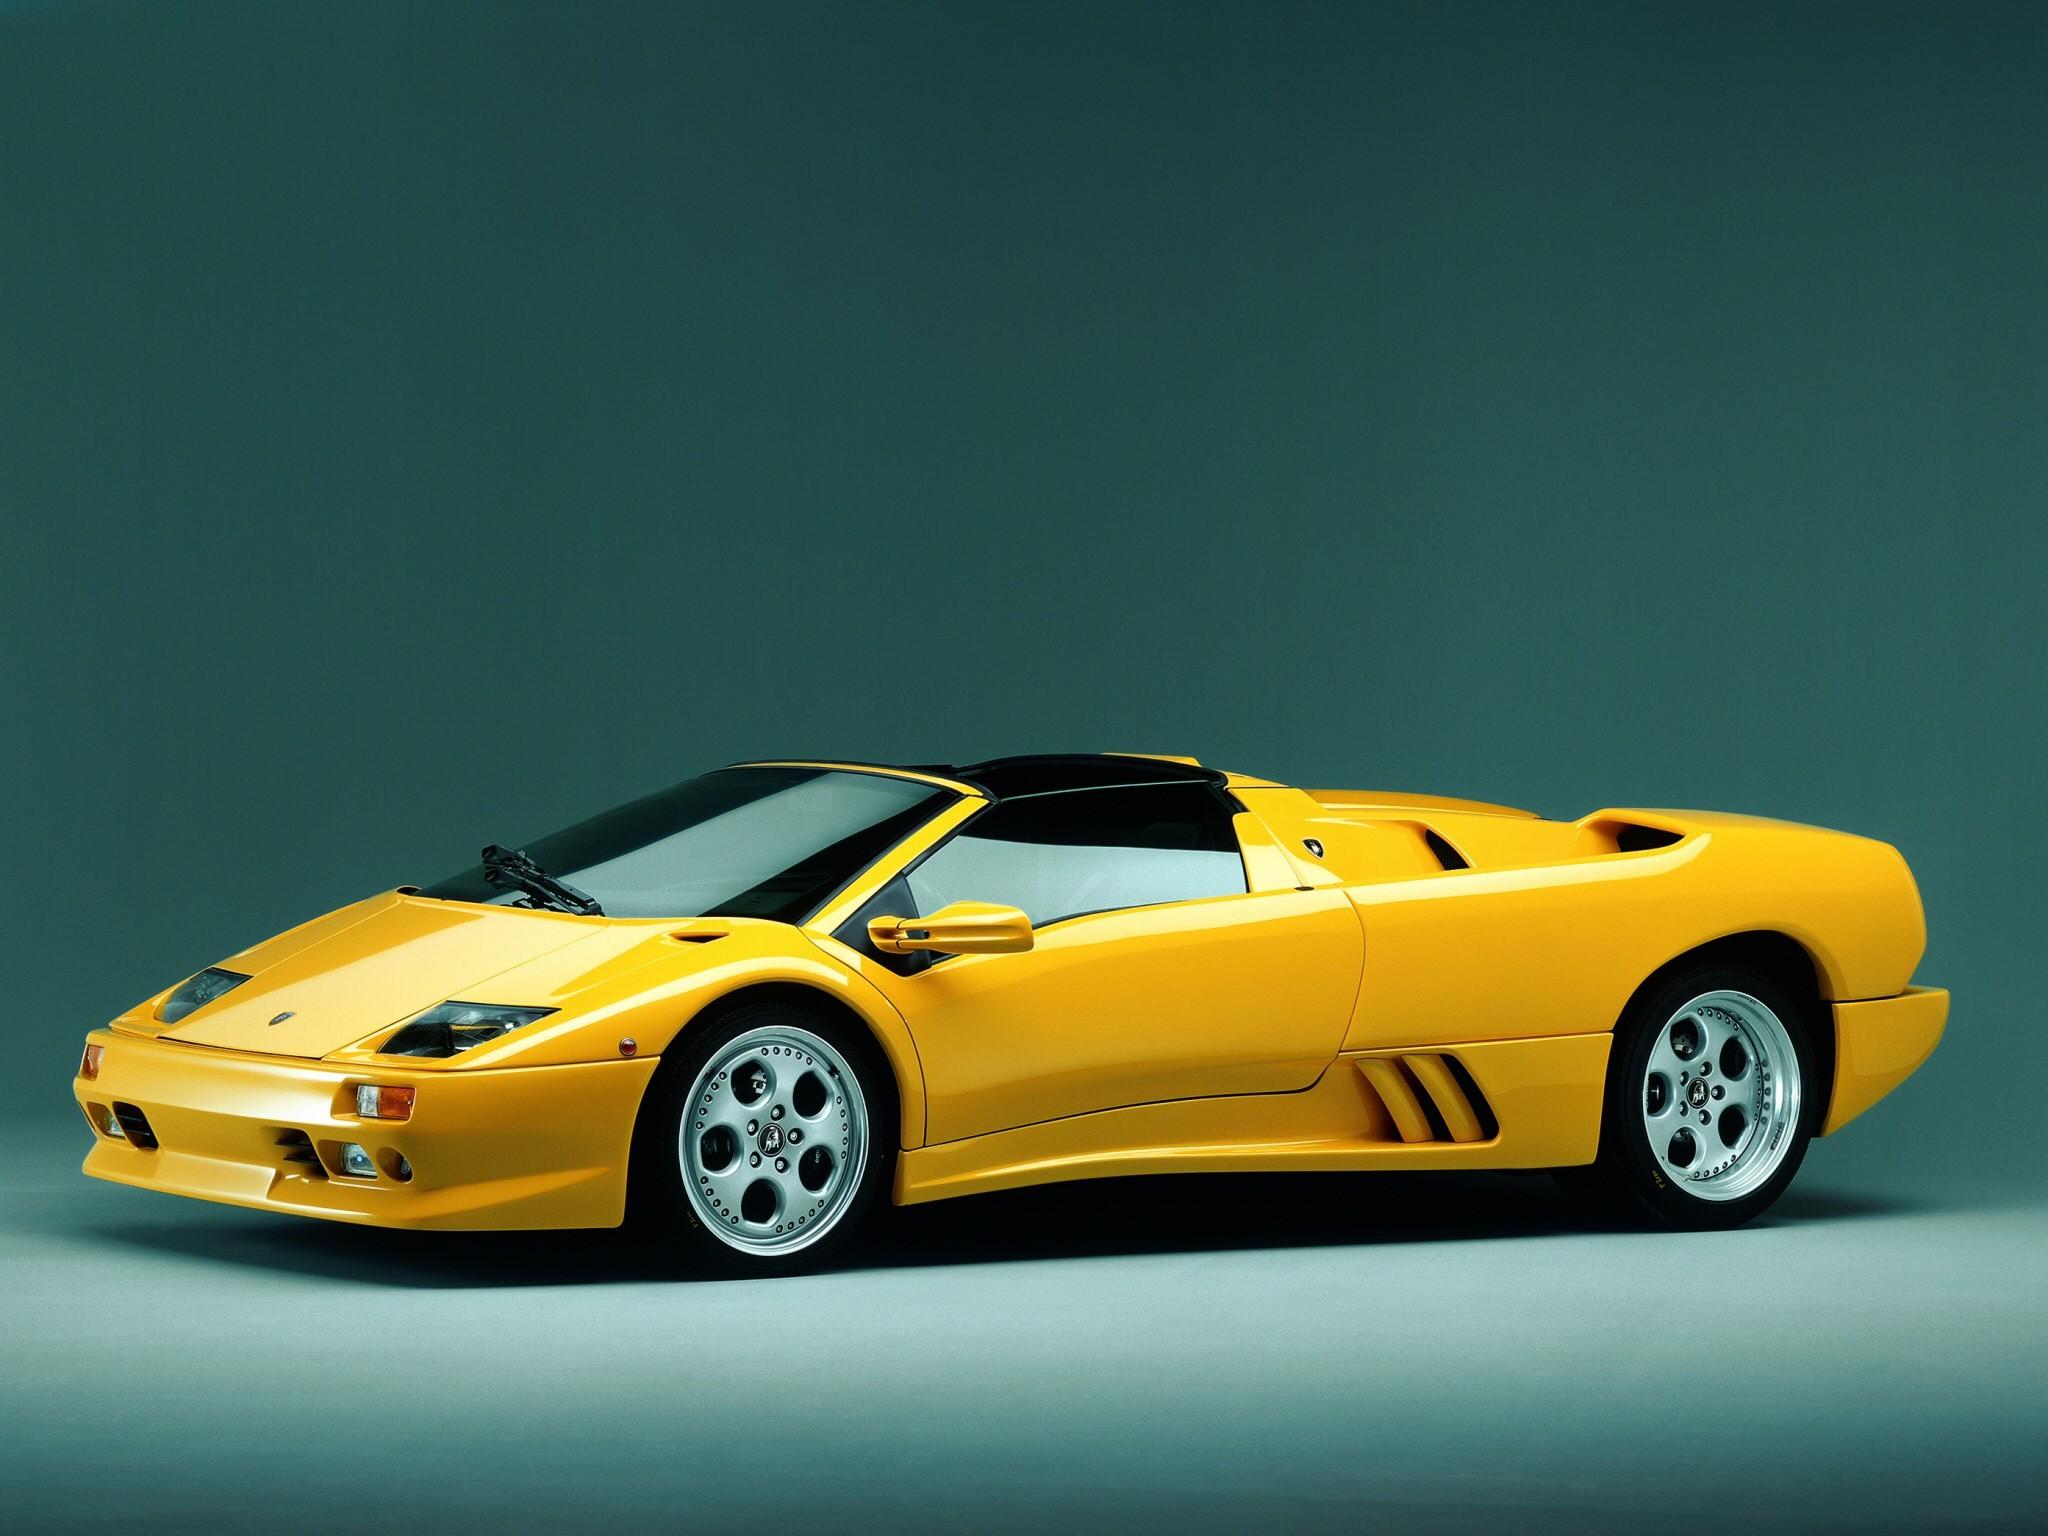 Lamborghini Diablo Roadster 1996